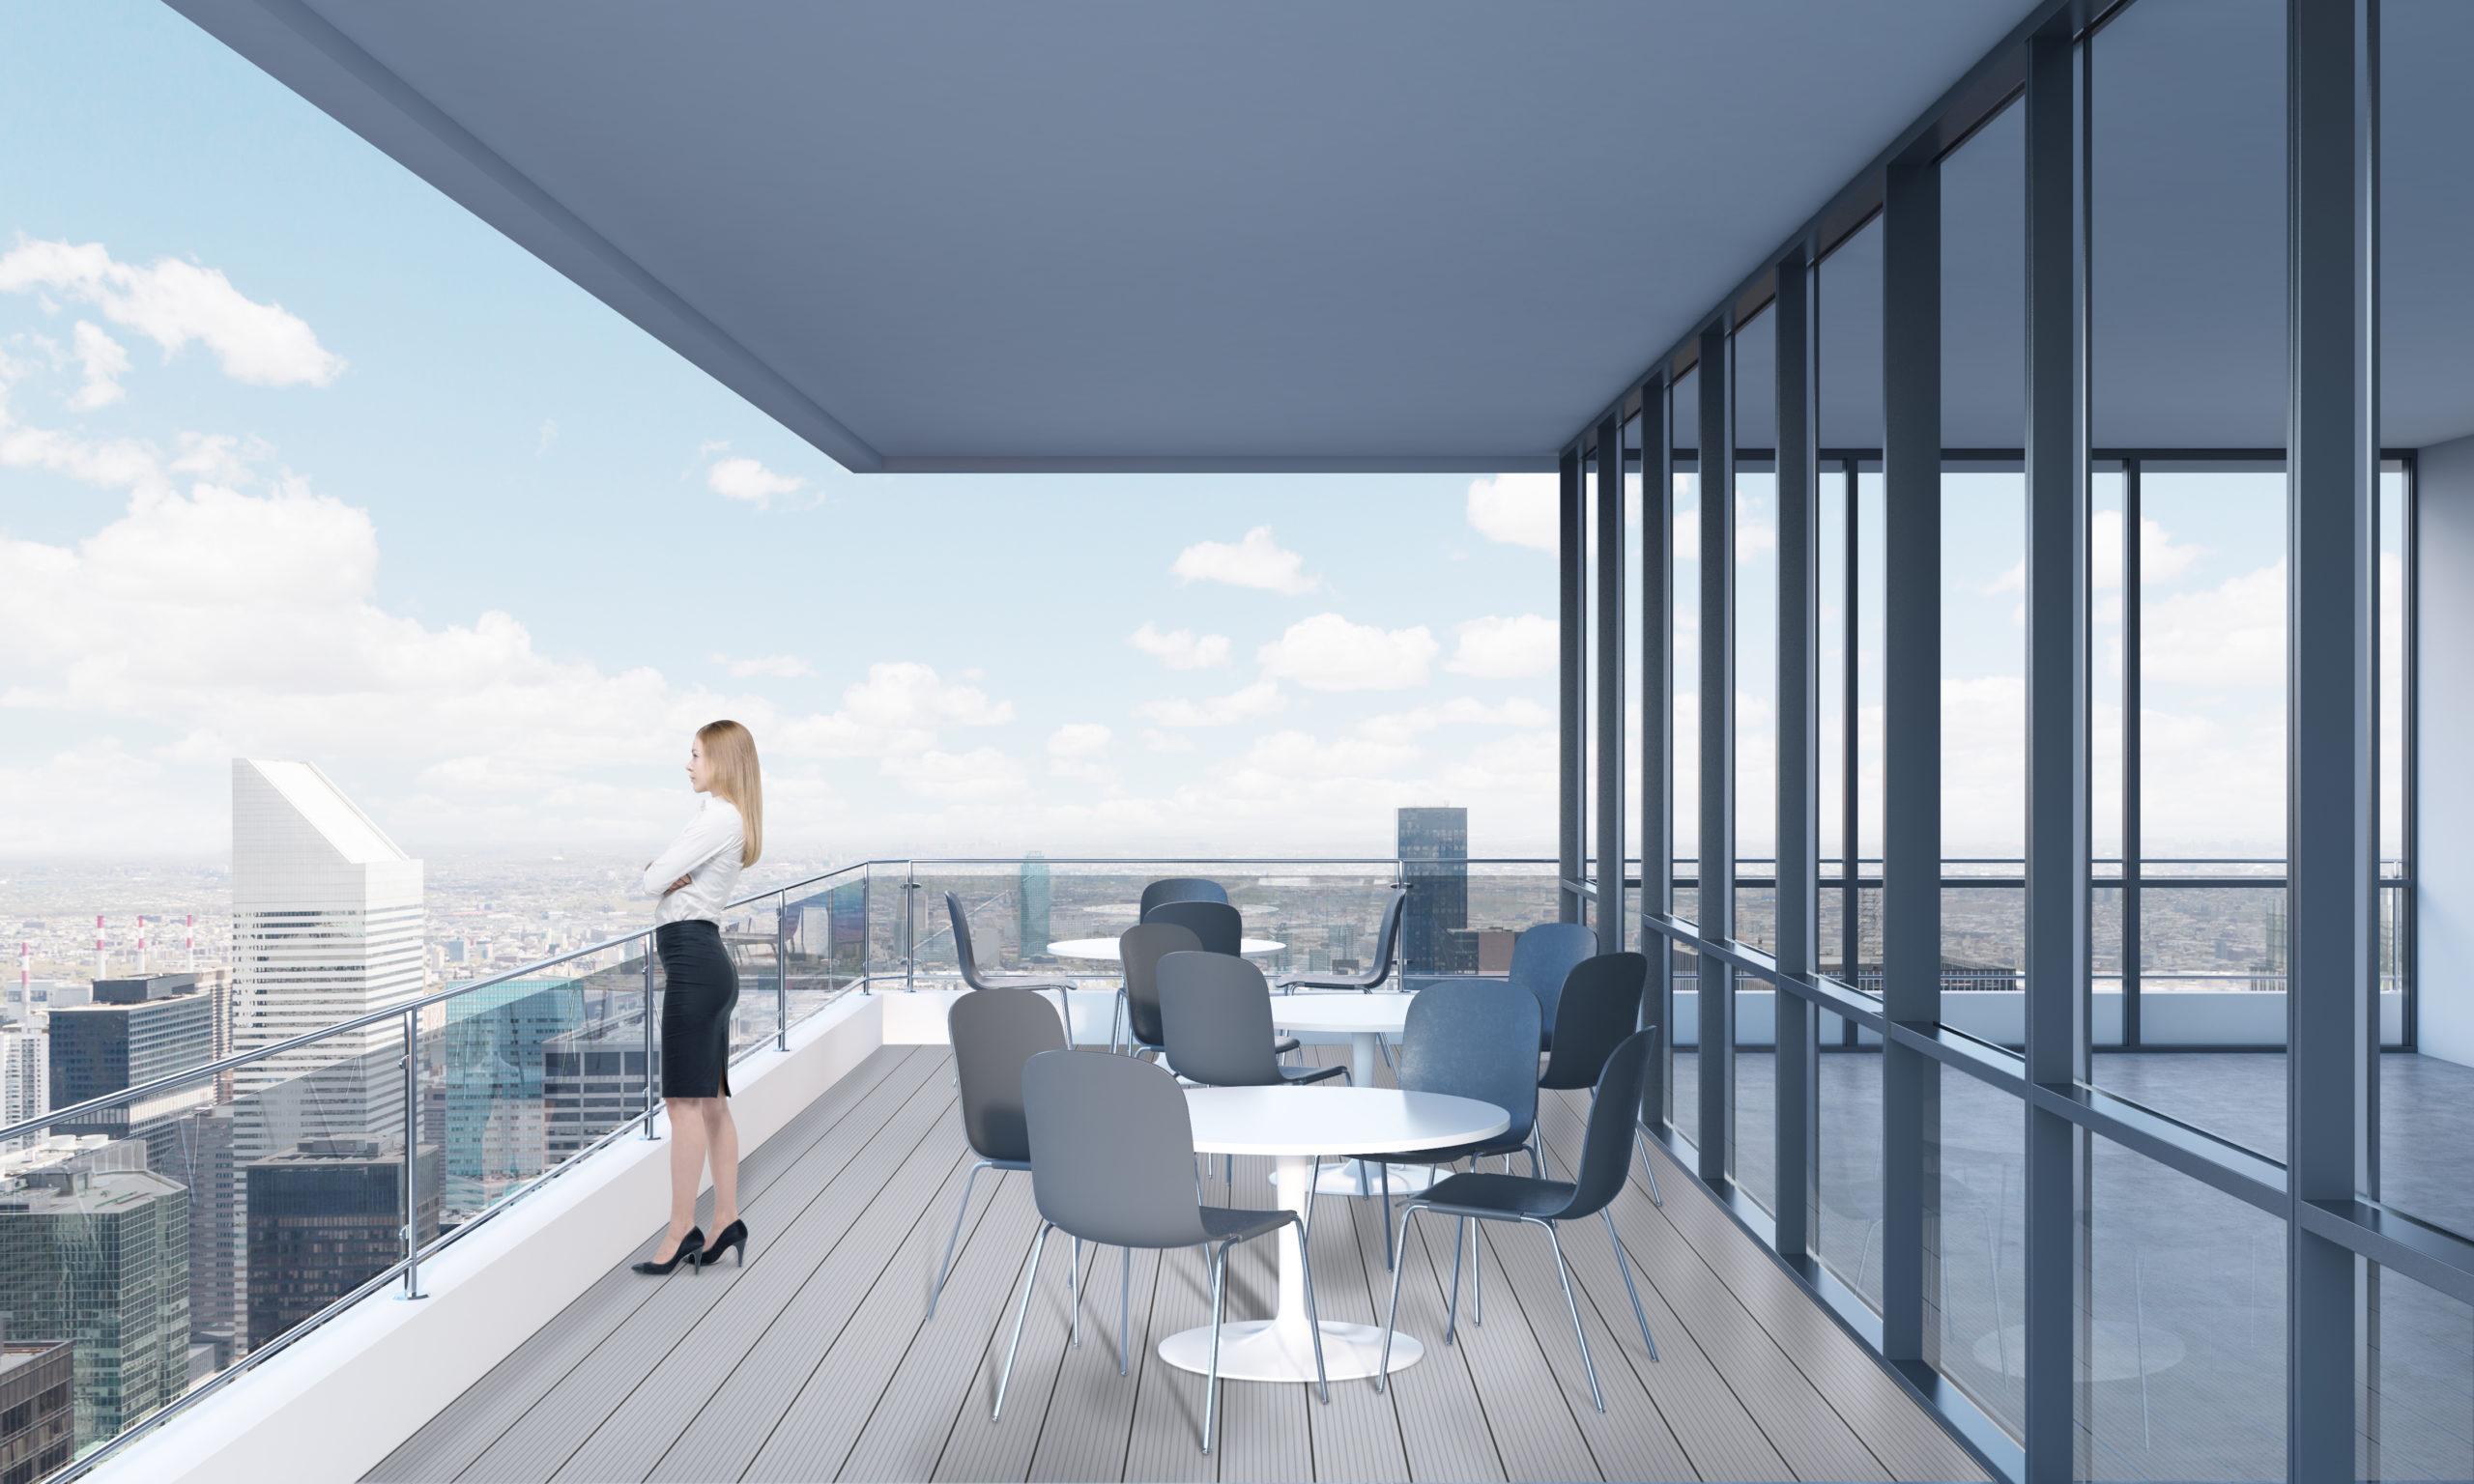 deski tarasowe - podrasuj swój balkon